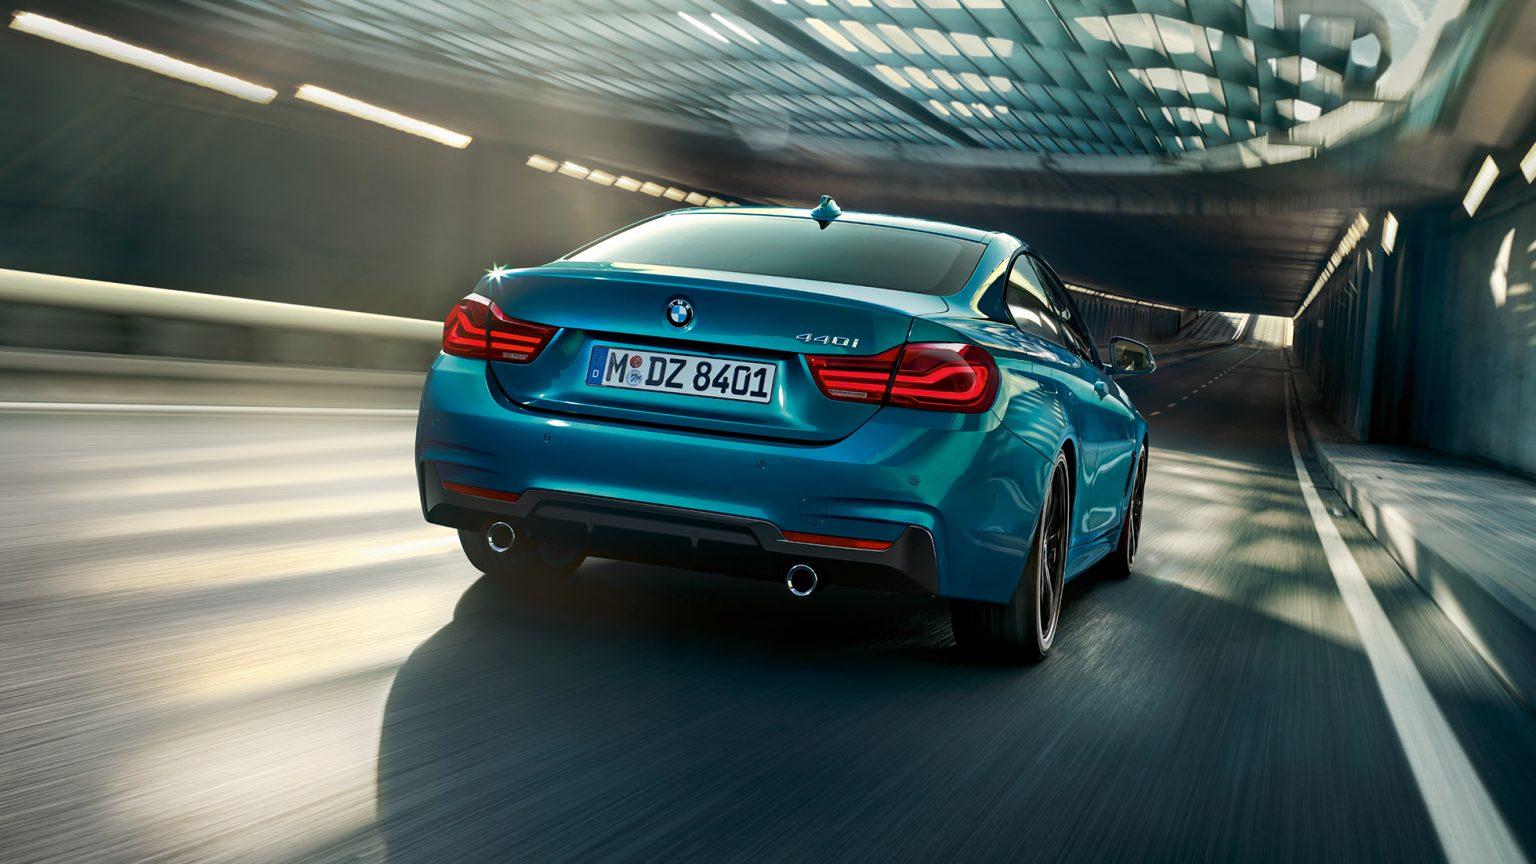 bmw-4-series-coupe-inspire-highlight-desktop-03